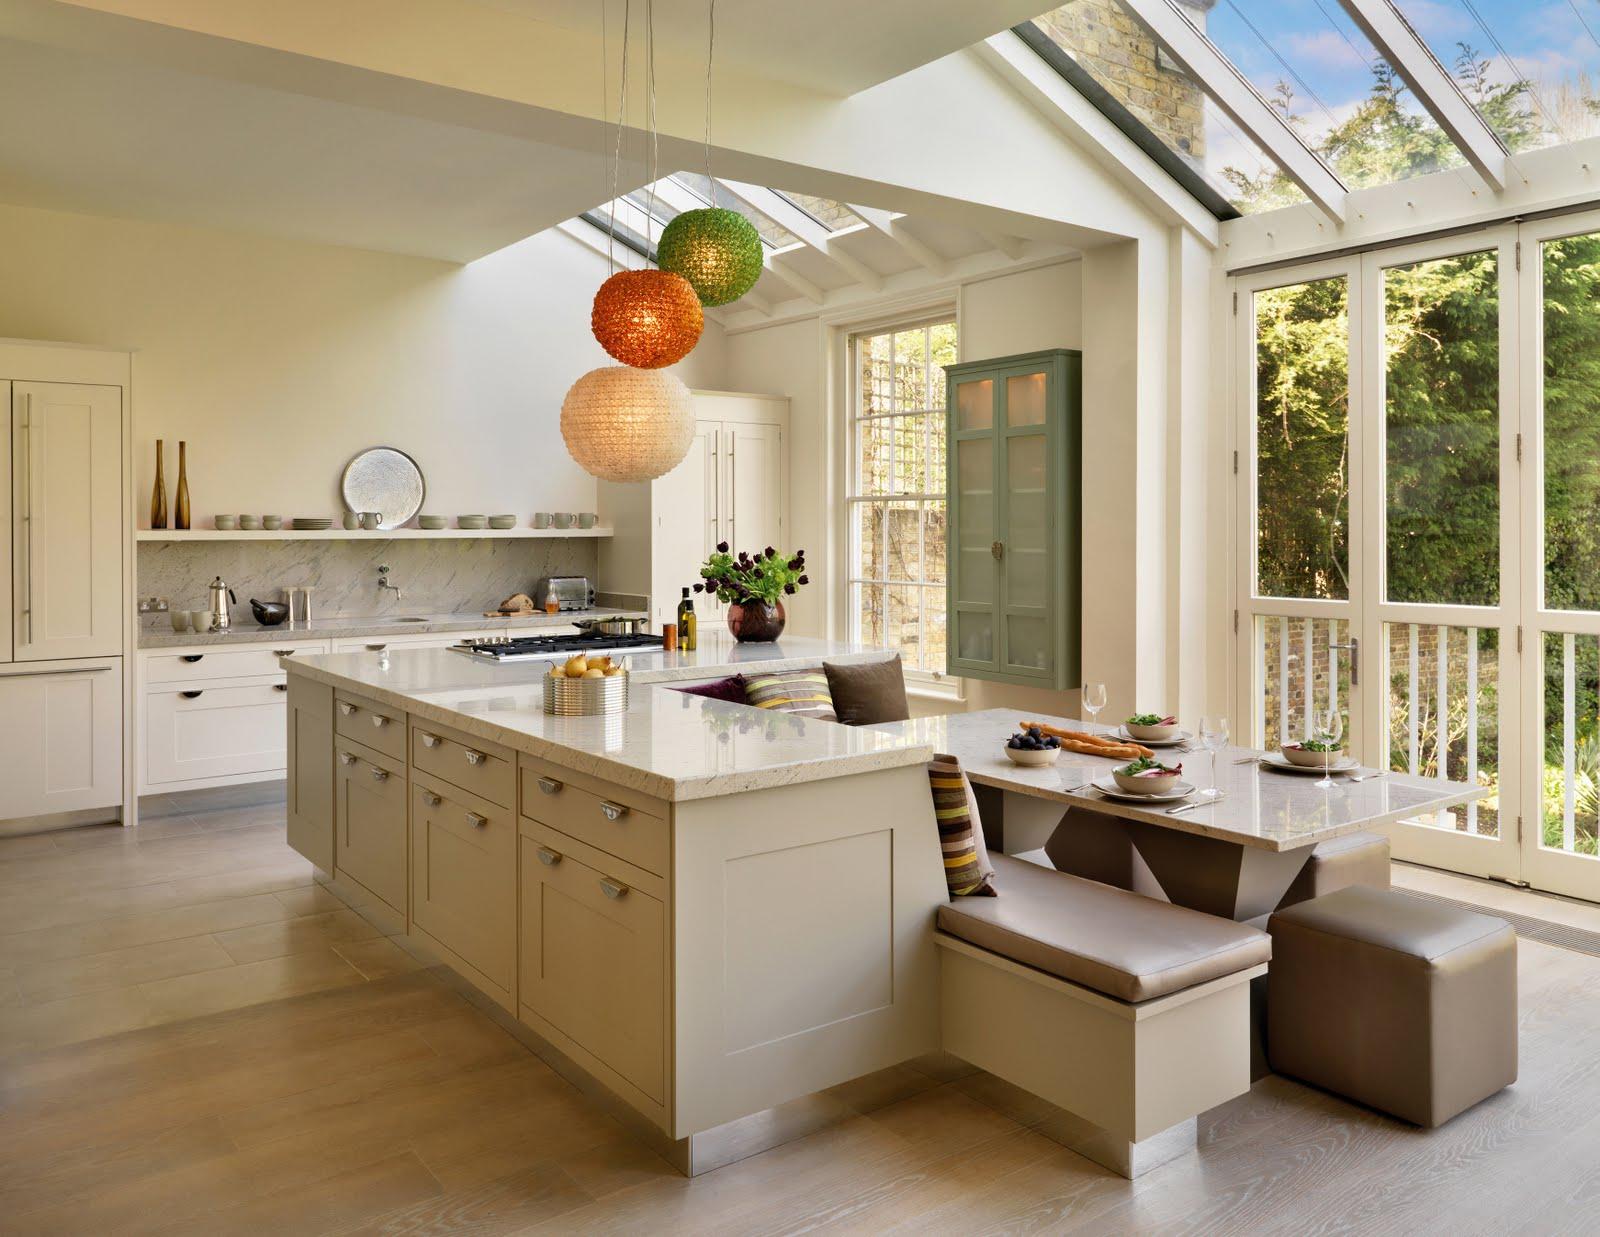 Kitchen island on wheels – Kitchen ideas